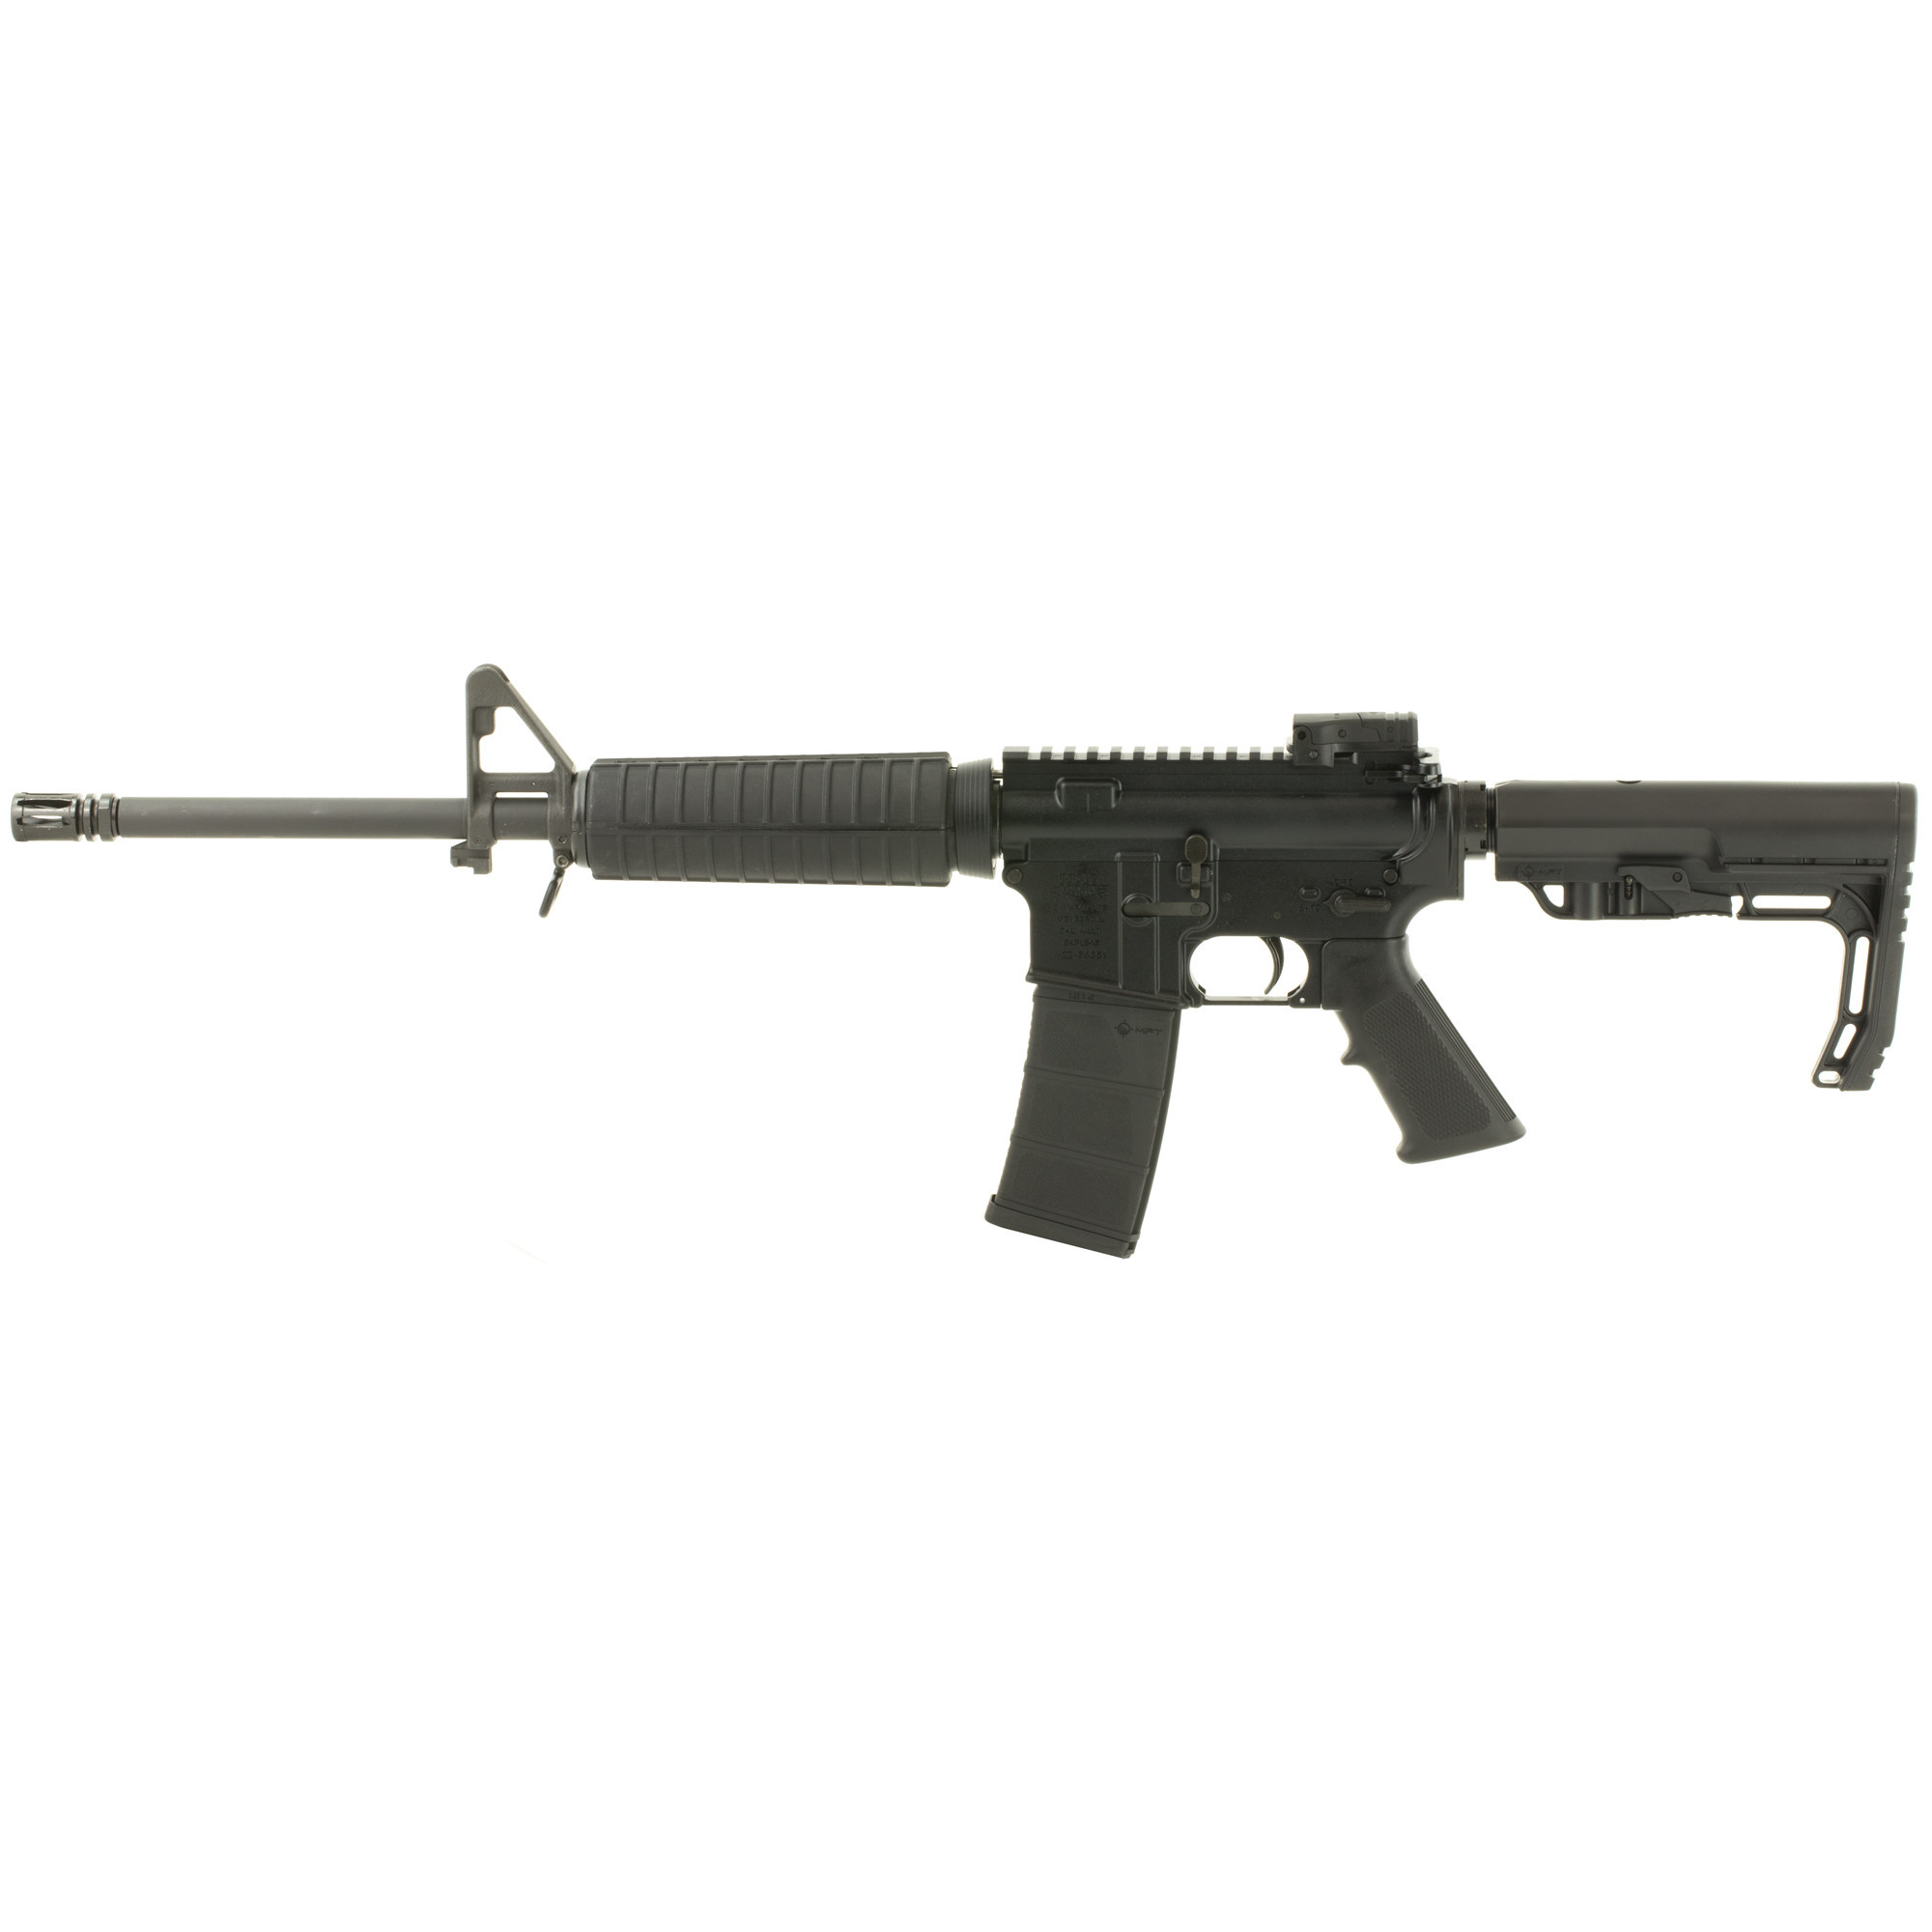 Armalite ArmaLite M-15